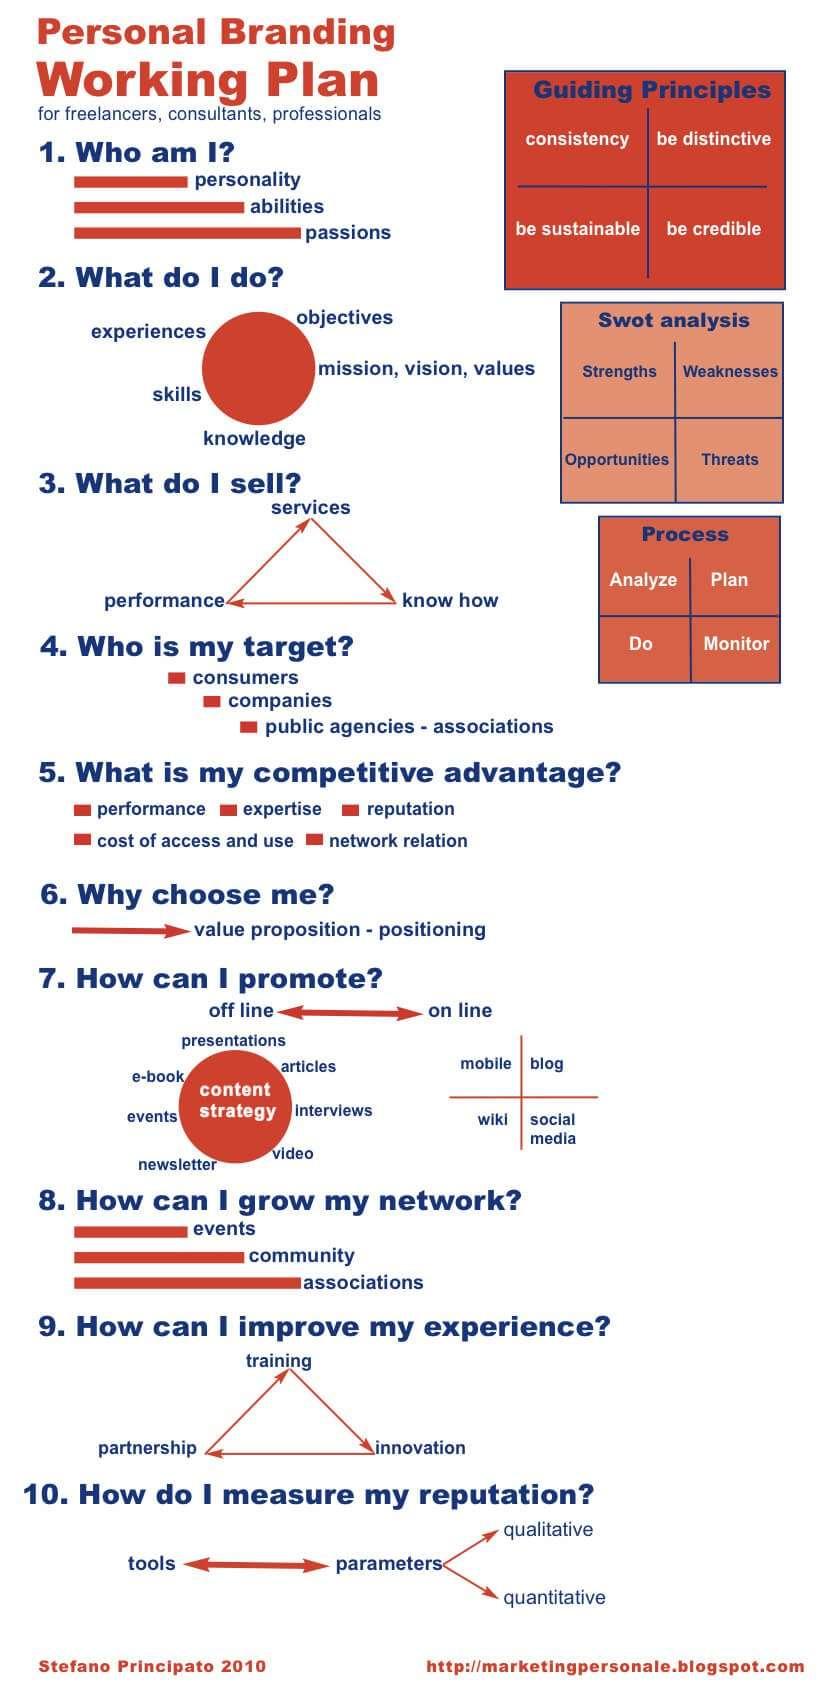 Personal branding working plan